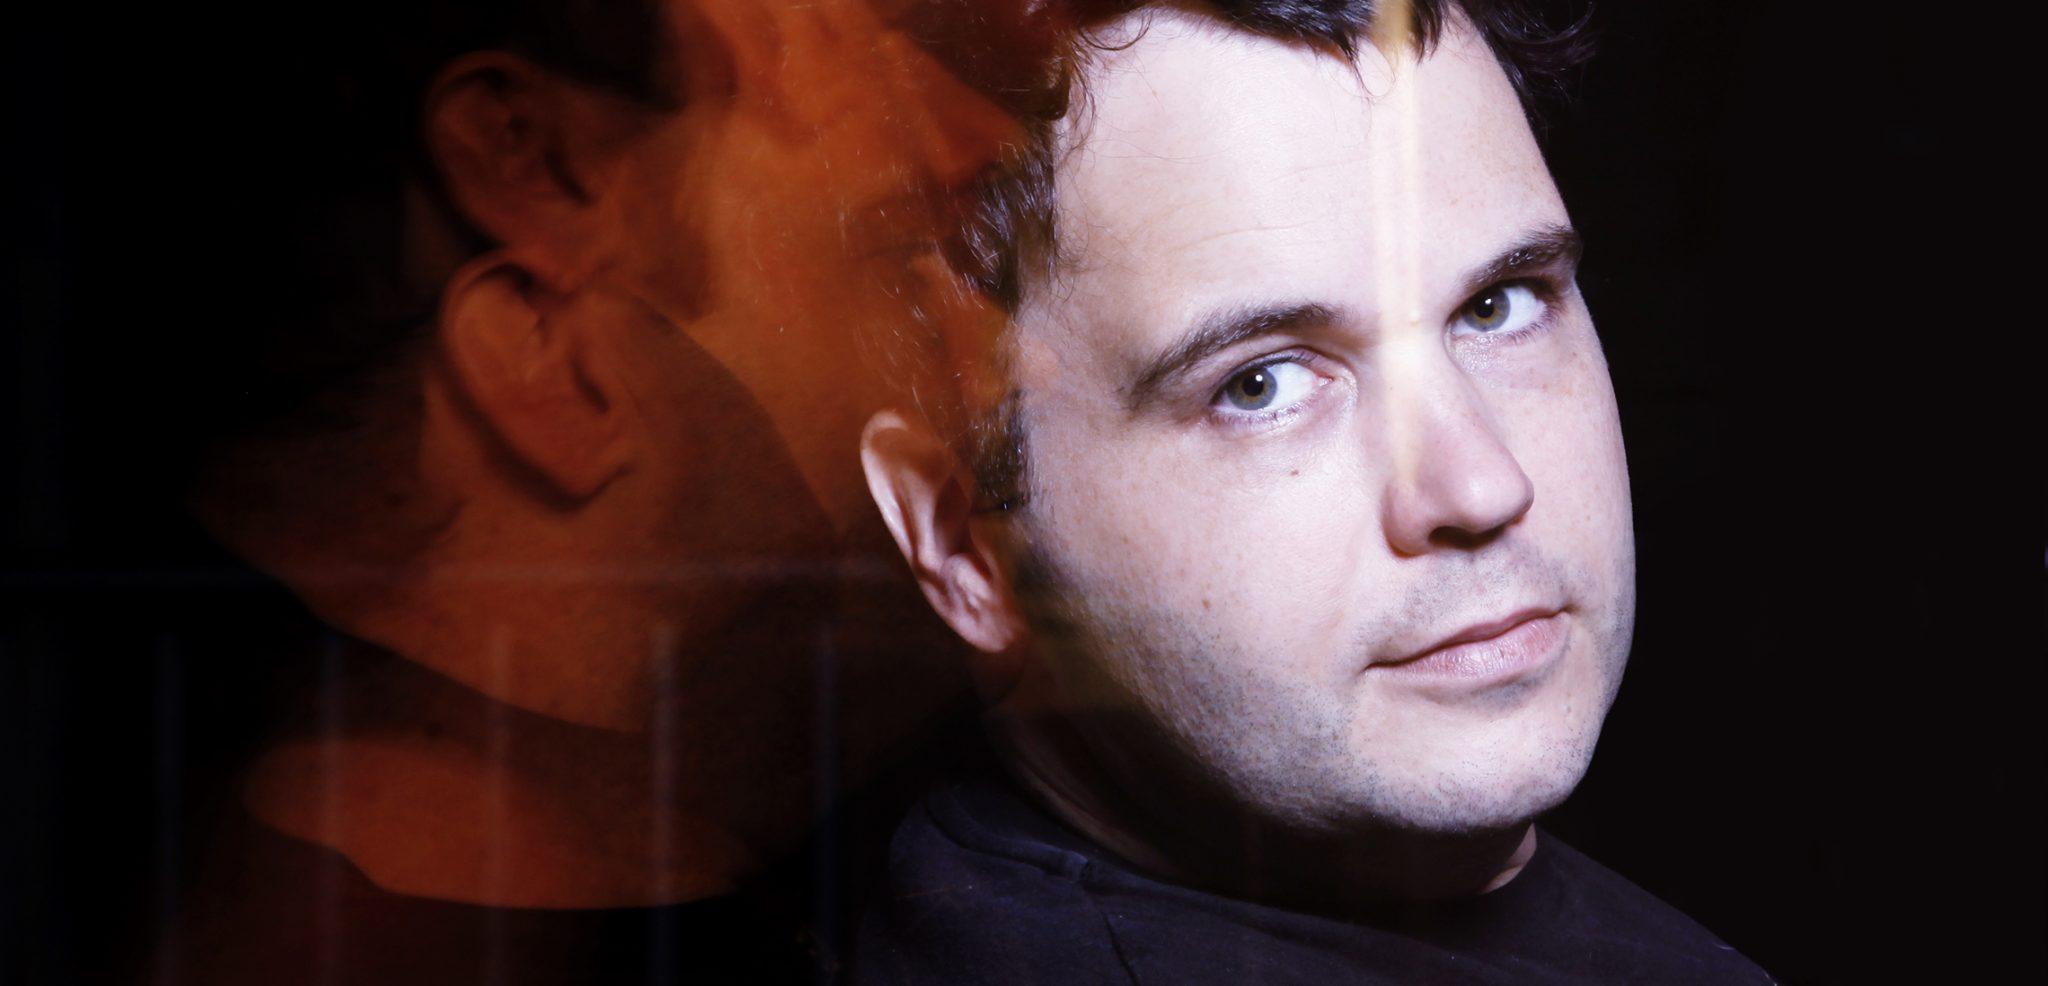 Ryan Murgatroyd - Something Said Remixes hero